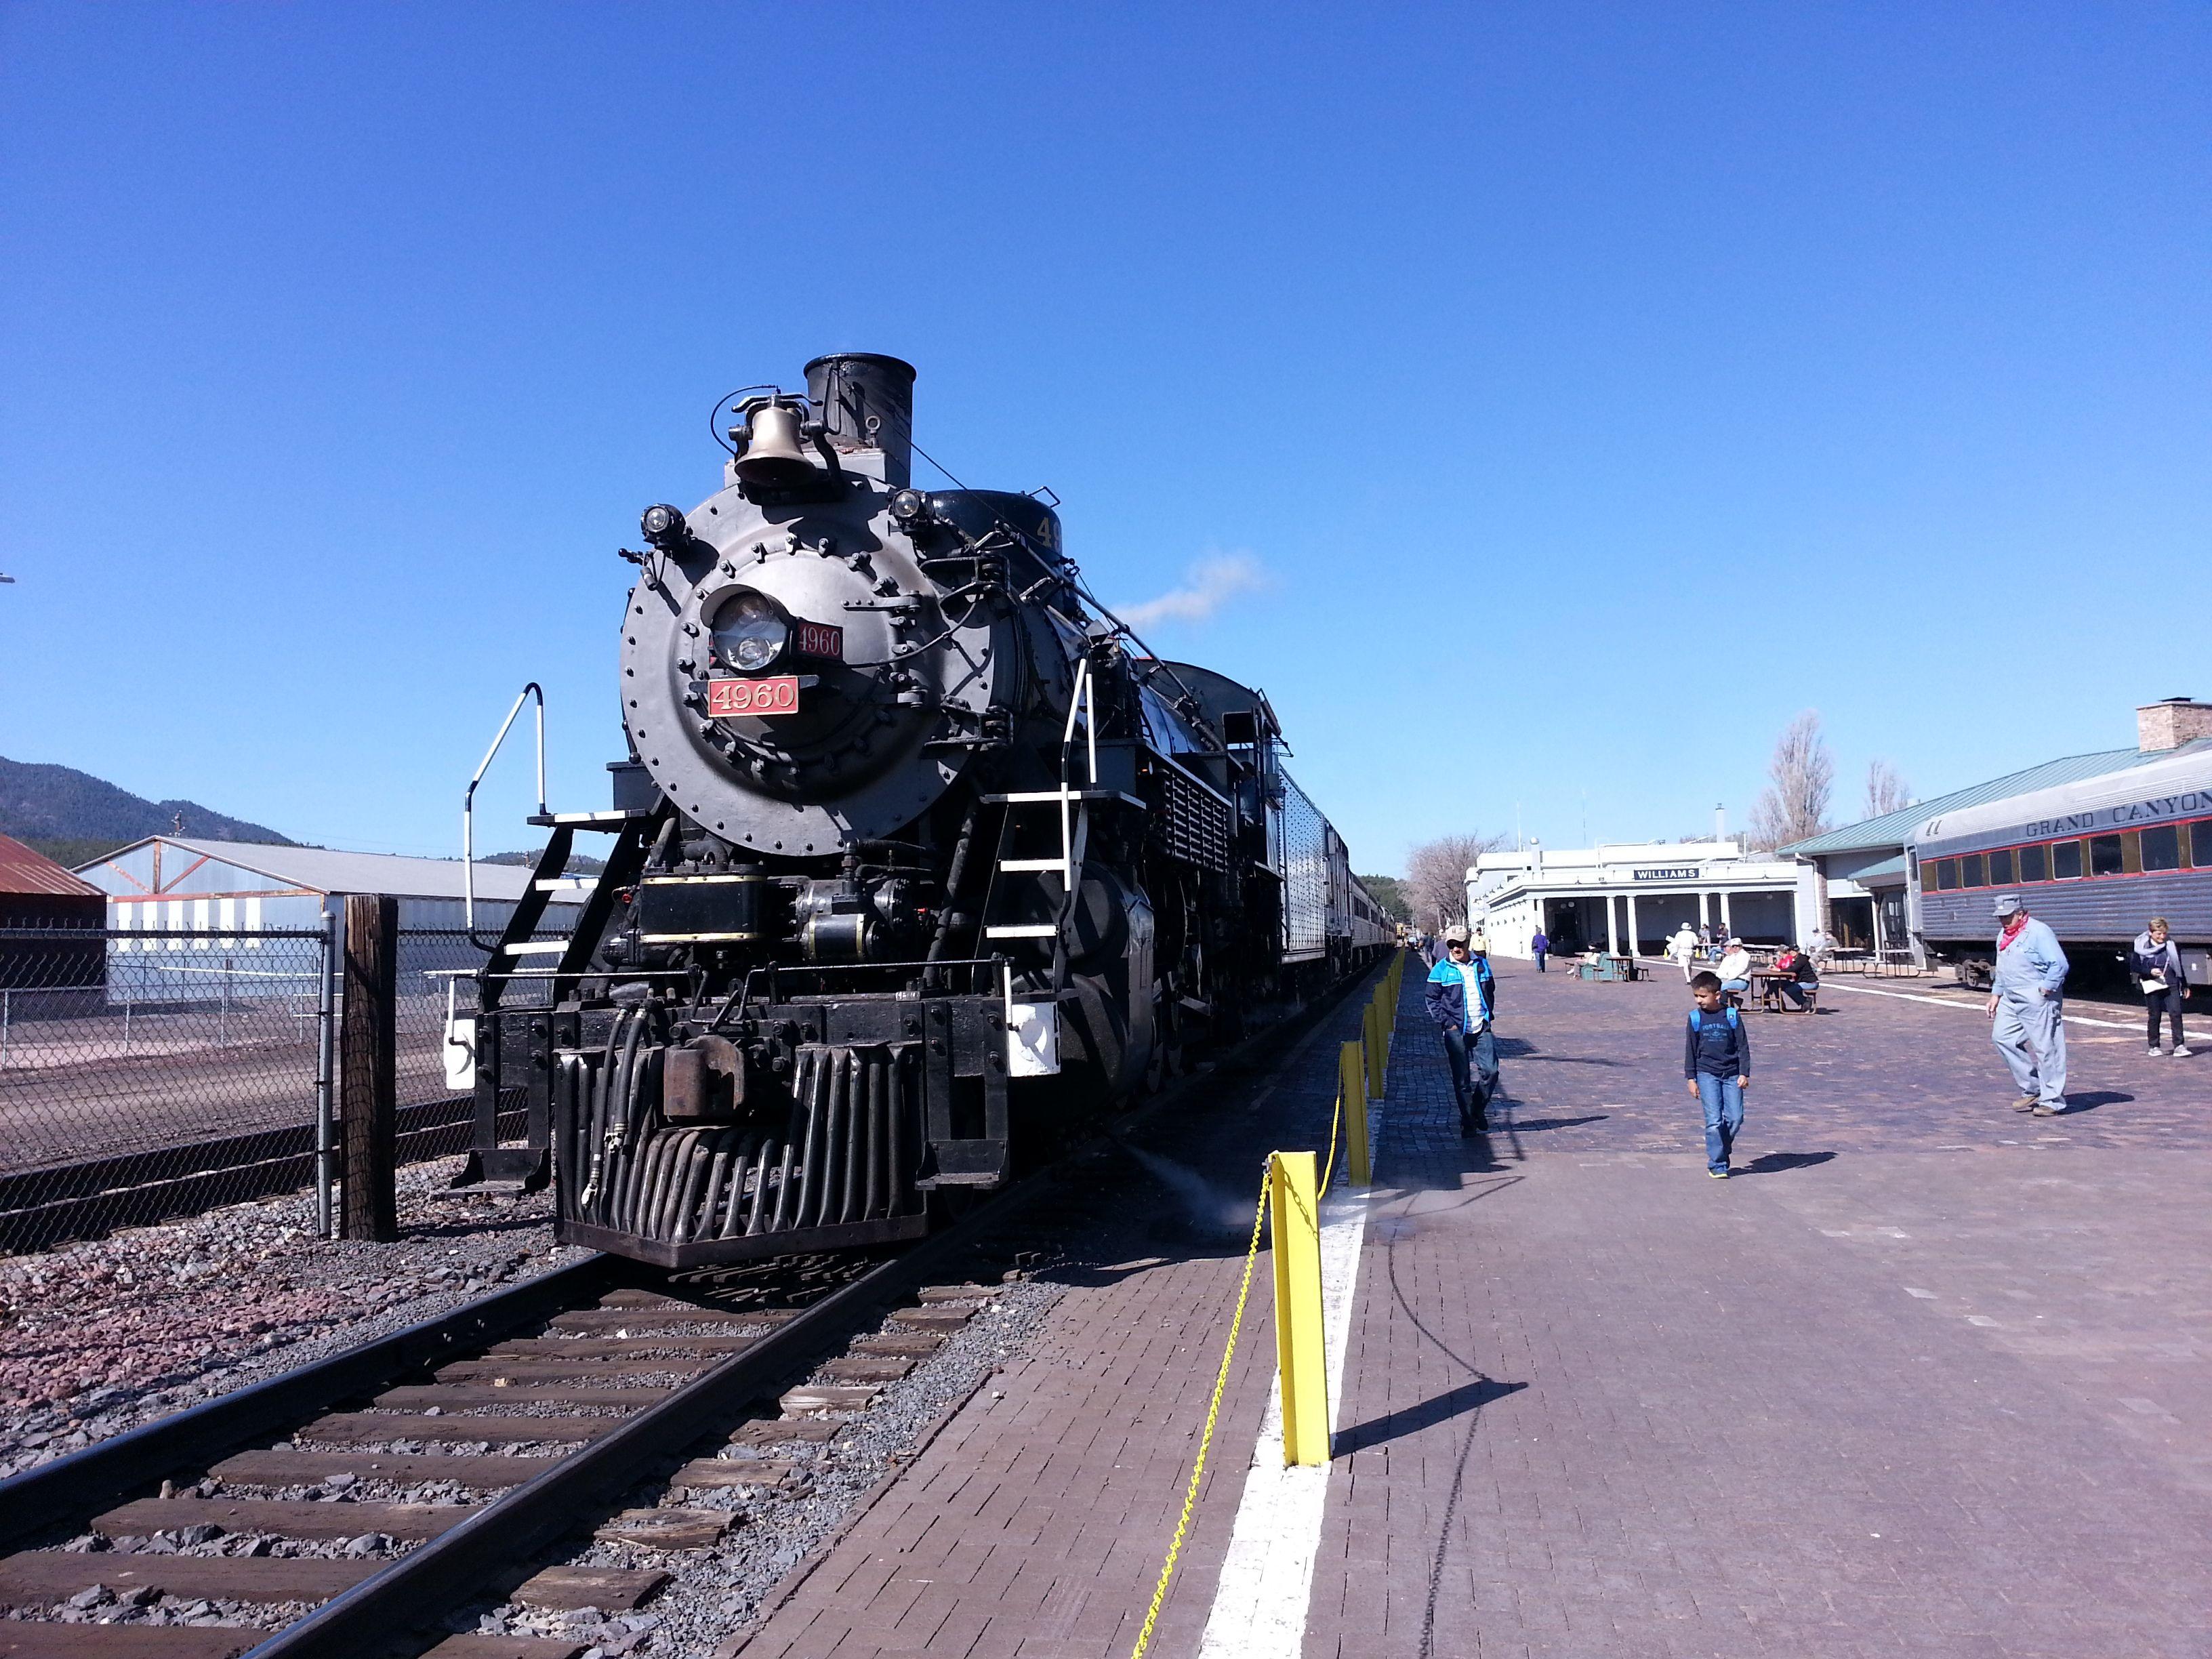 Grand Canyon railway train. Steam engine. Grand canyon